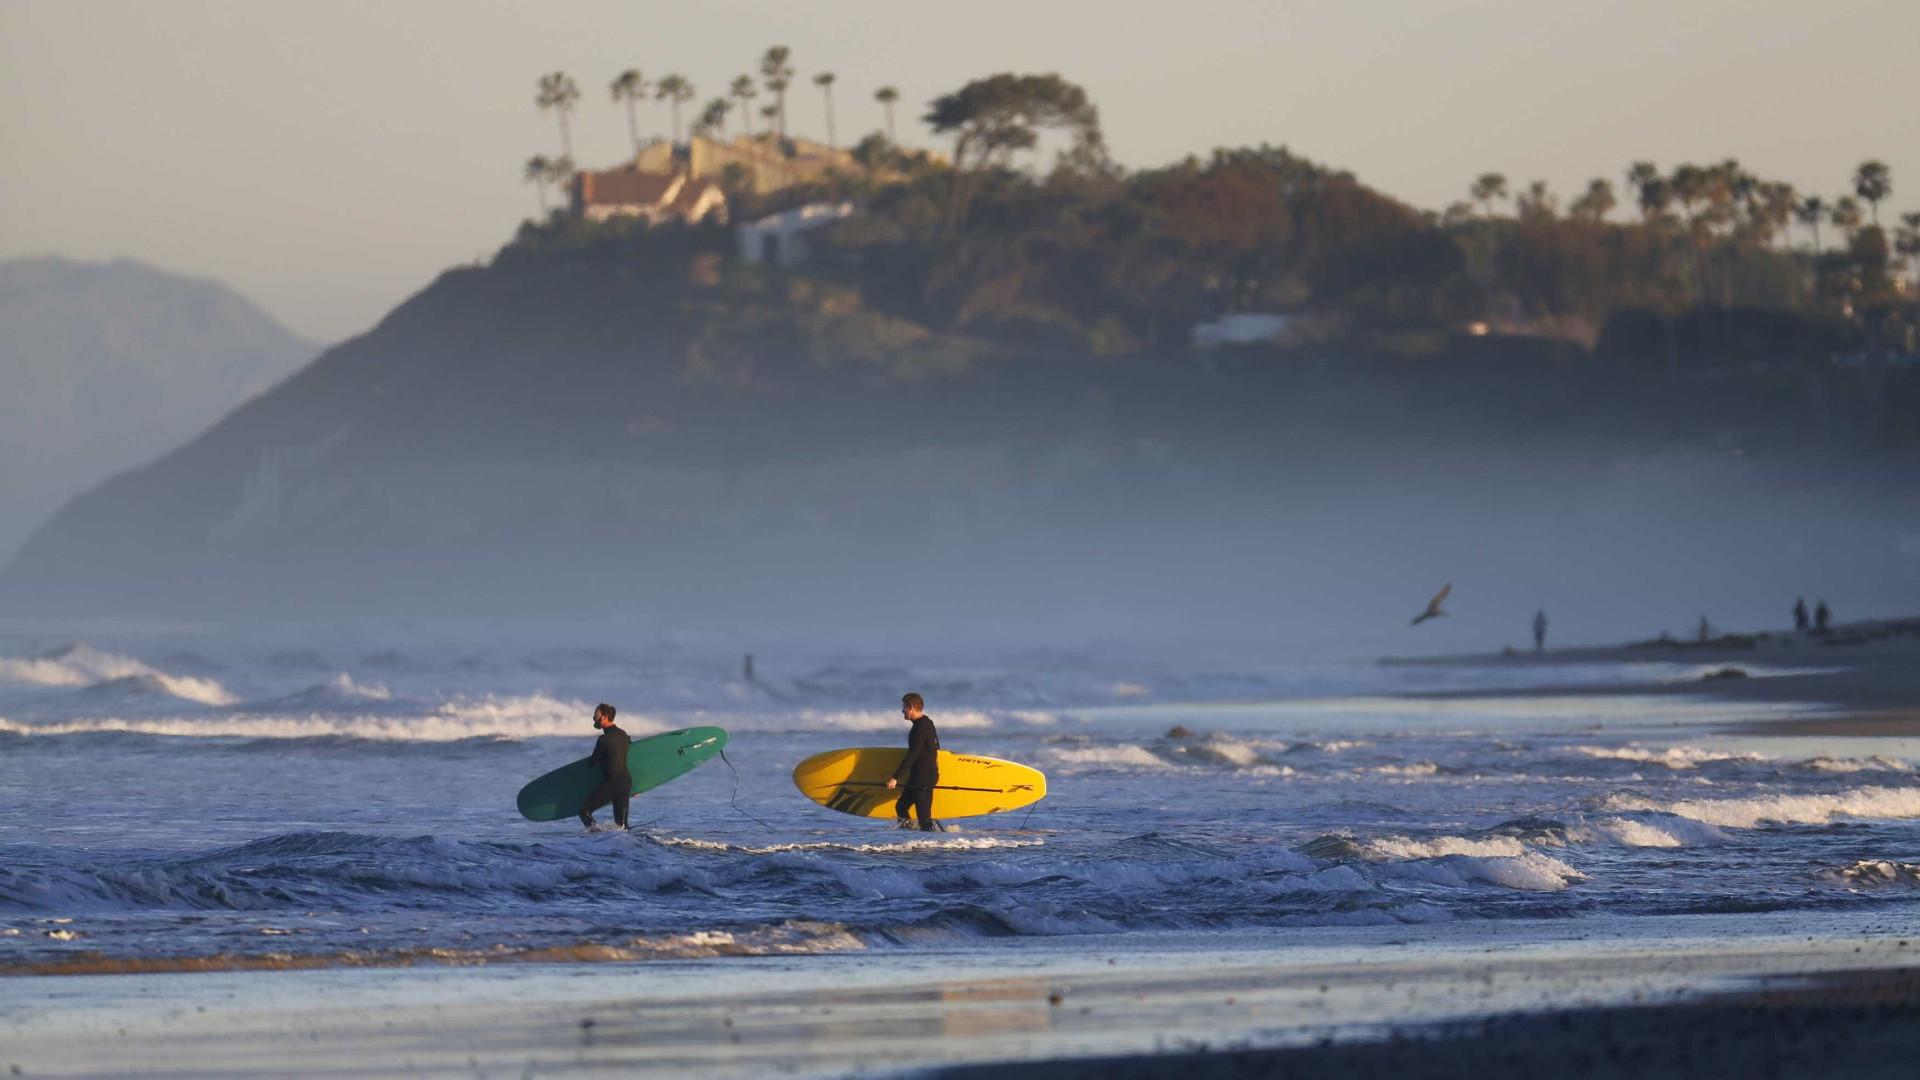 Coronavírus faz Liga Mundial de Surfe adiar Circuito Mundial